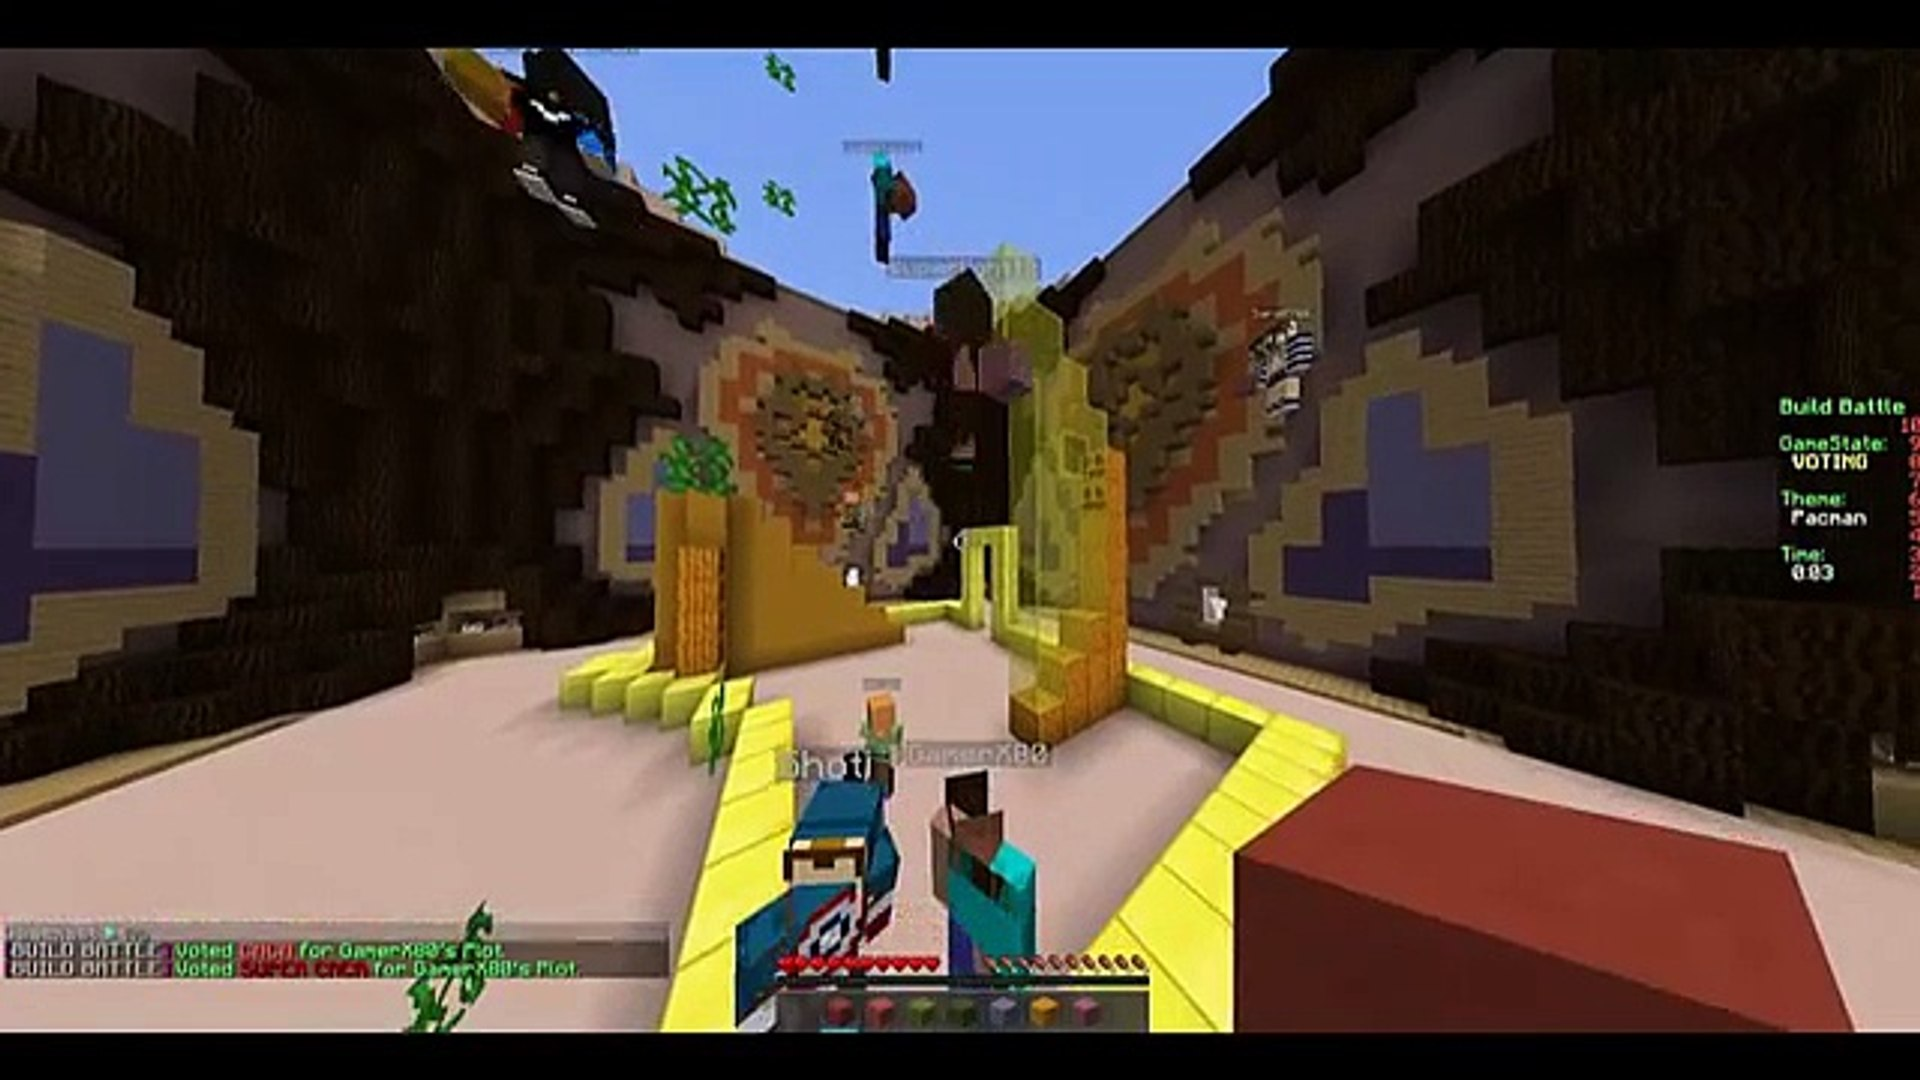 Hacks En BuildBattle?? || Minecraft BuildBattle